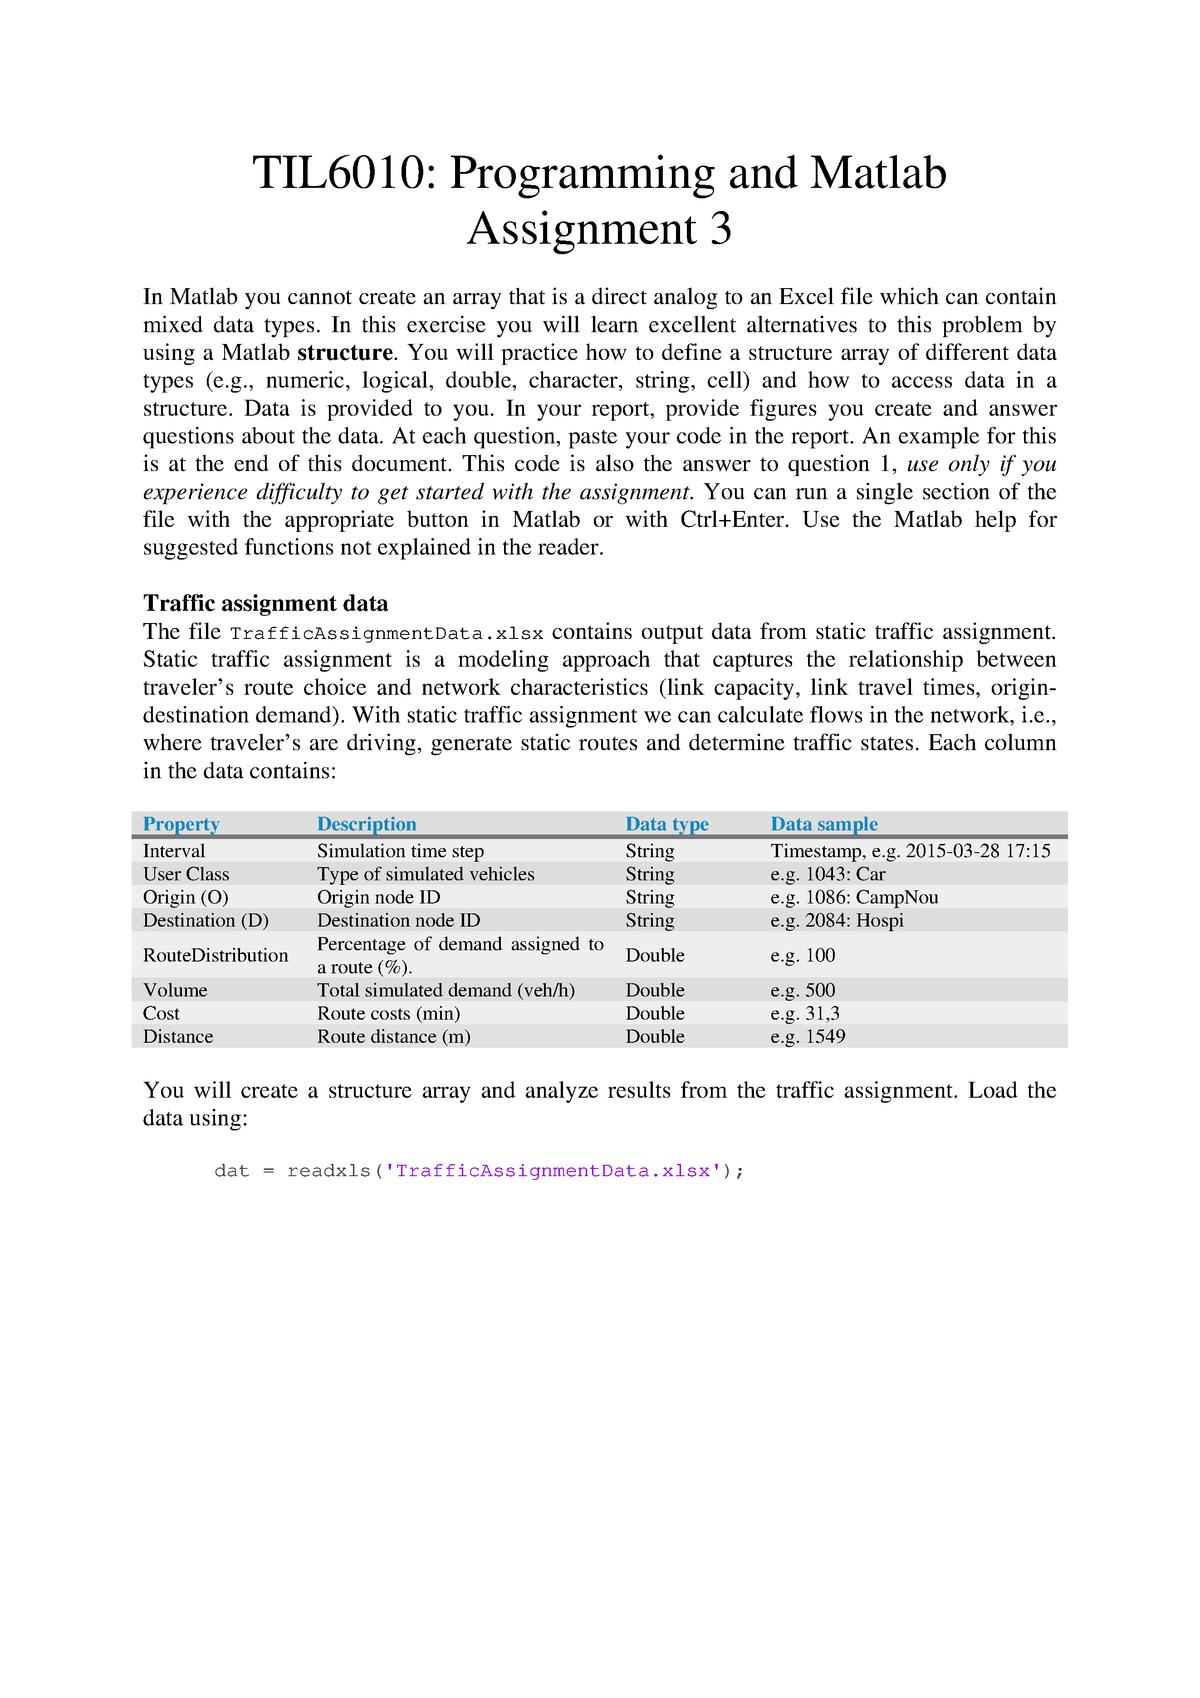 Assignment 3 - Opdracht 3 - TIL6010: TIL Programming